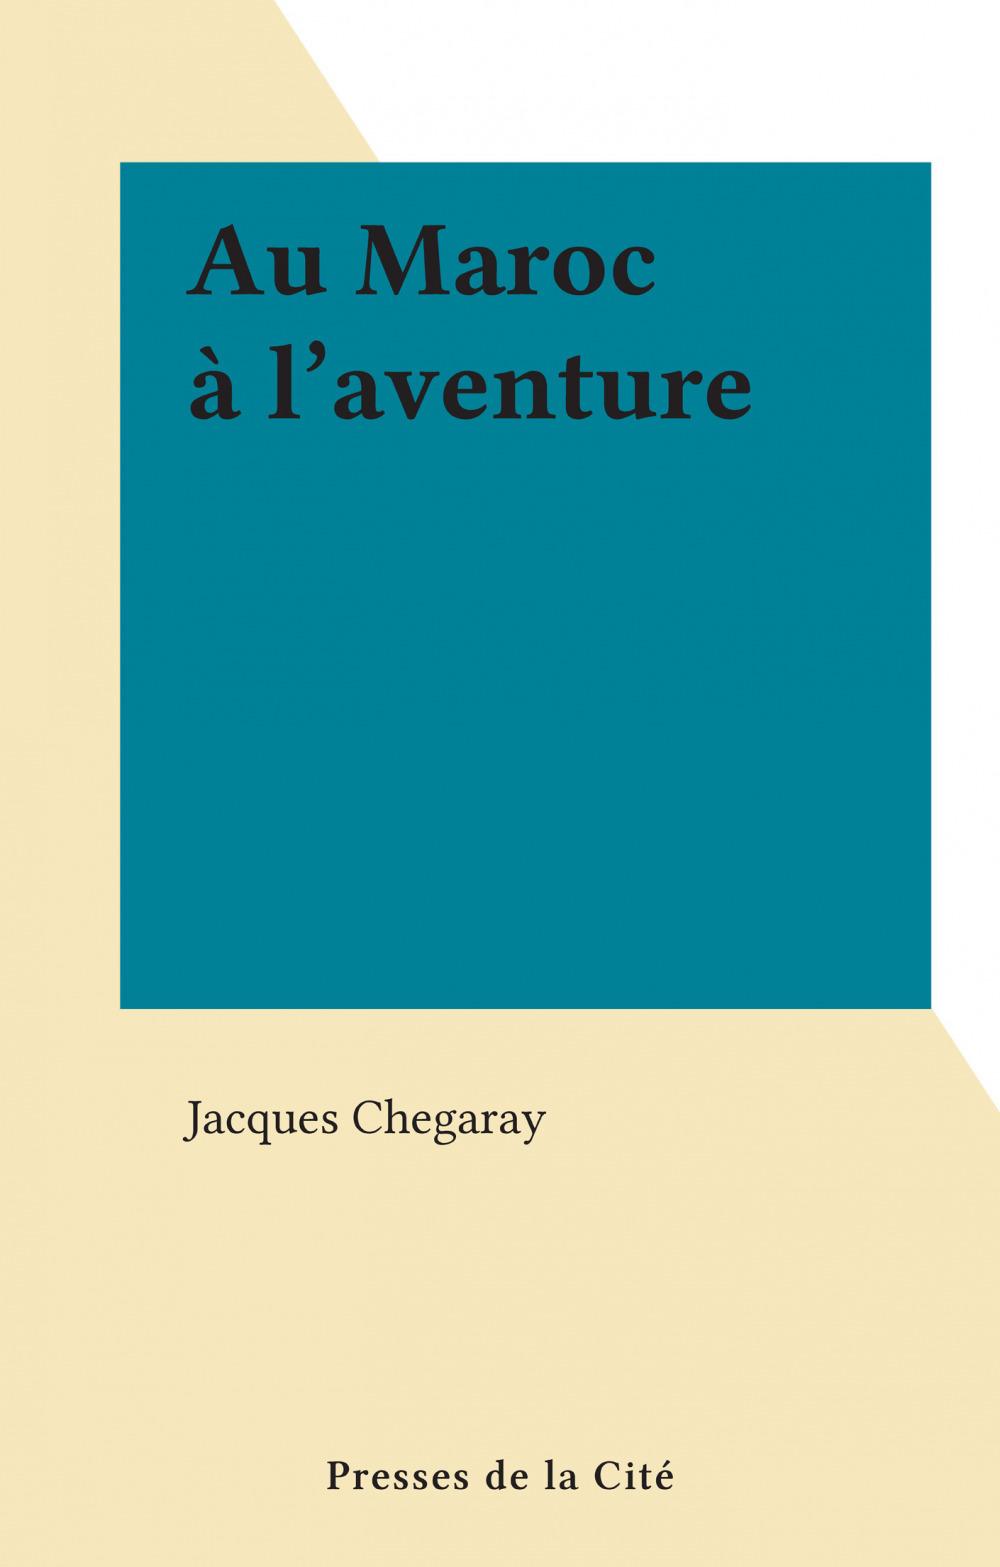 Au Maroc à l'aventure  - Jacques Chegaray